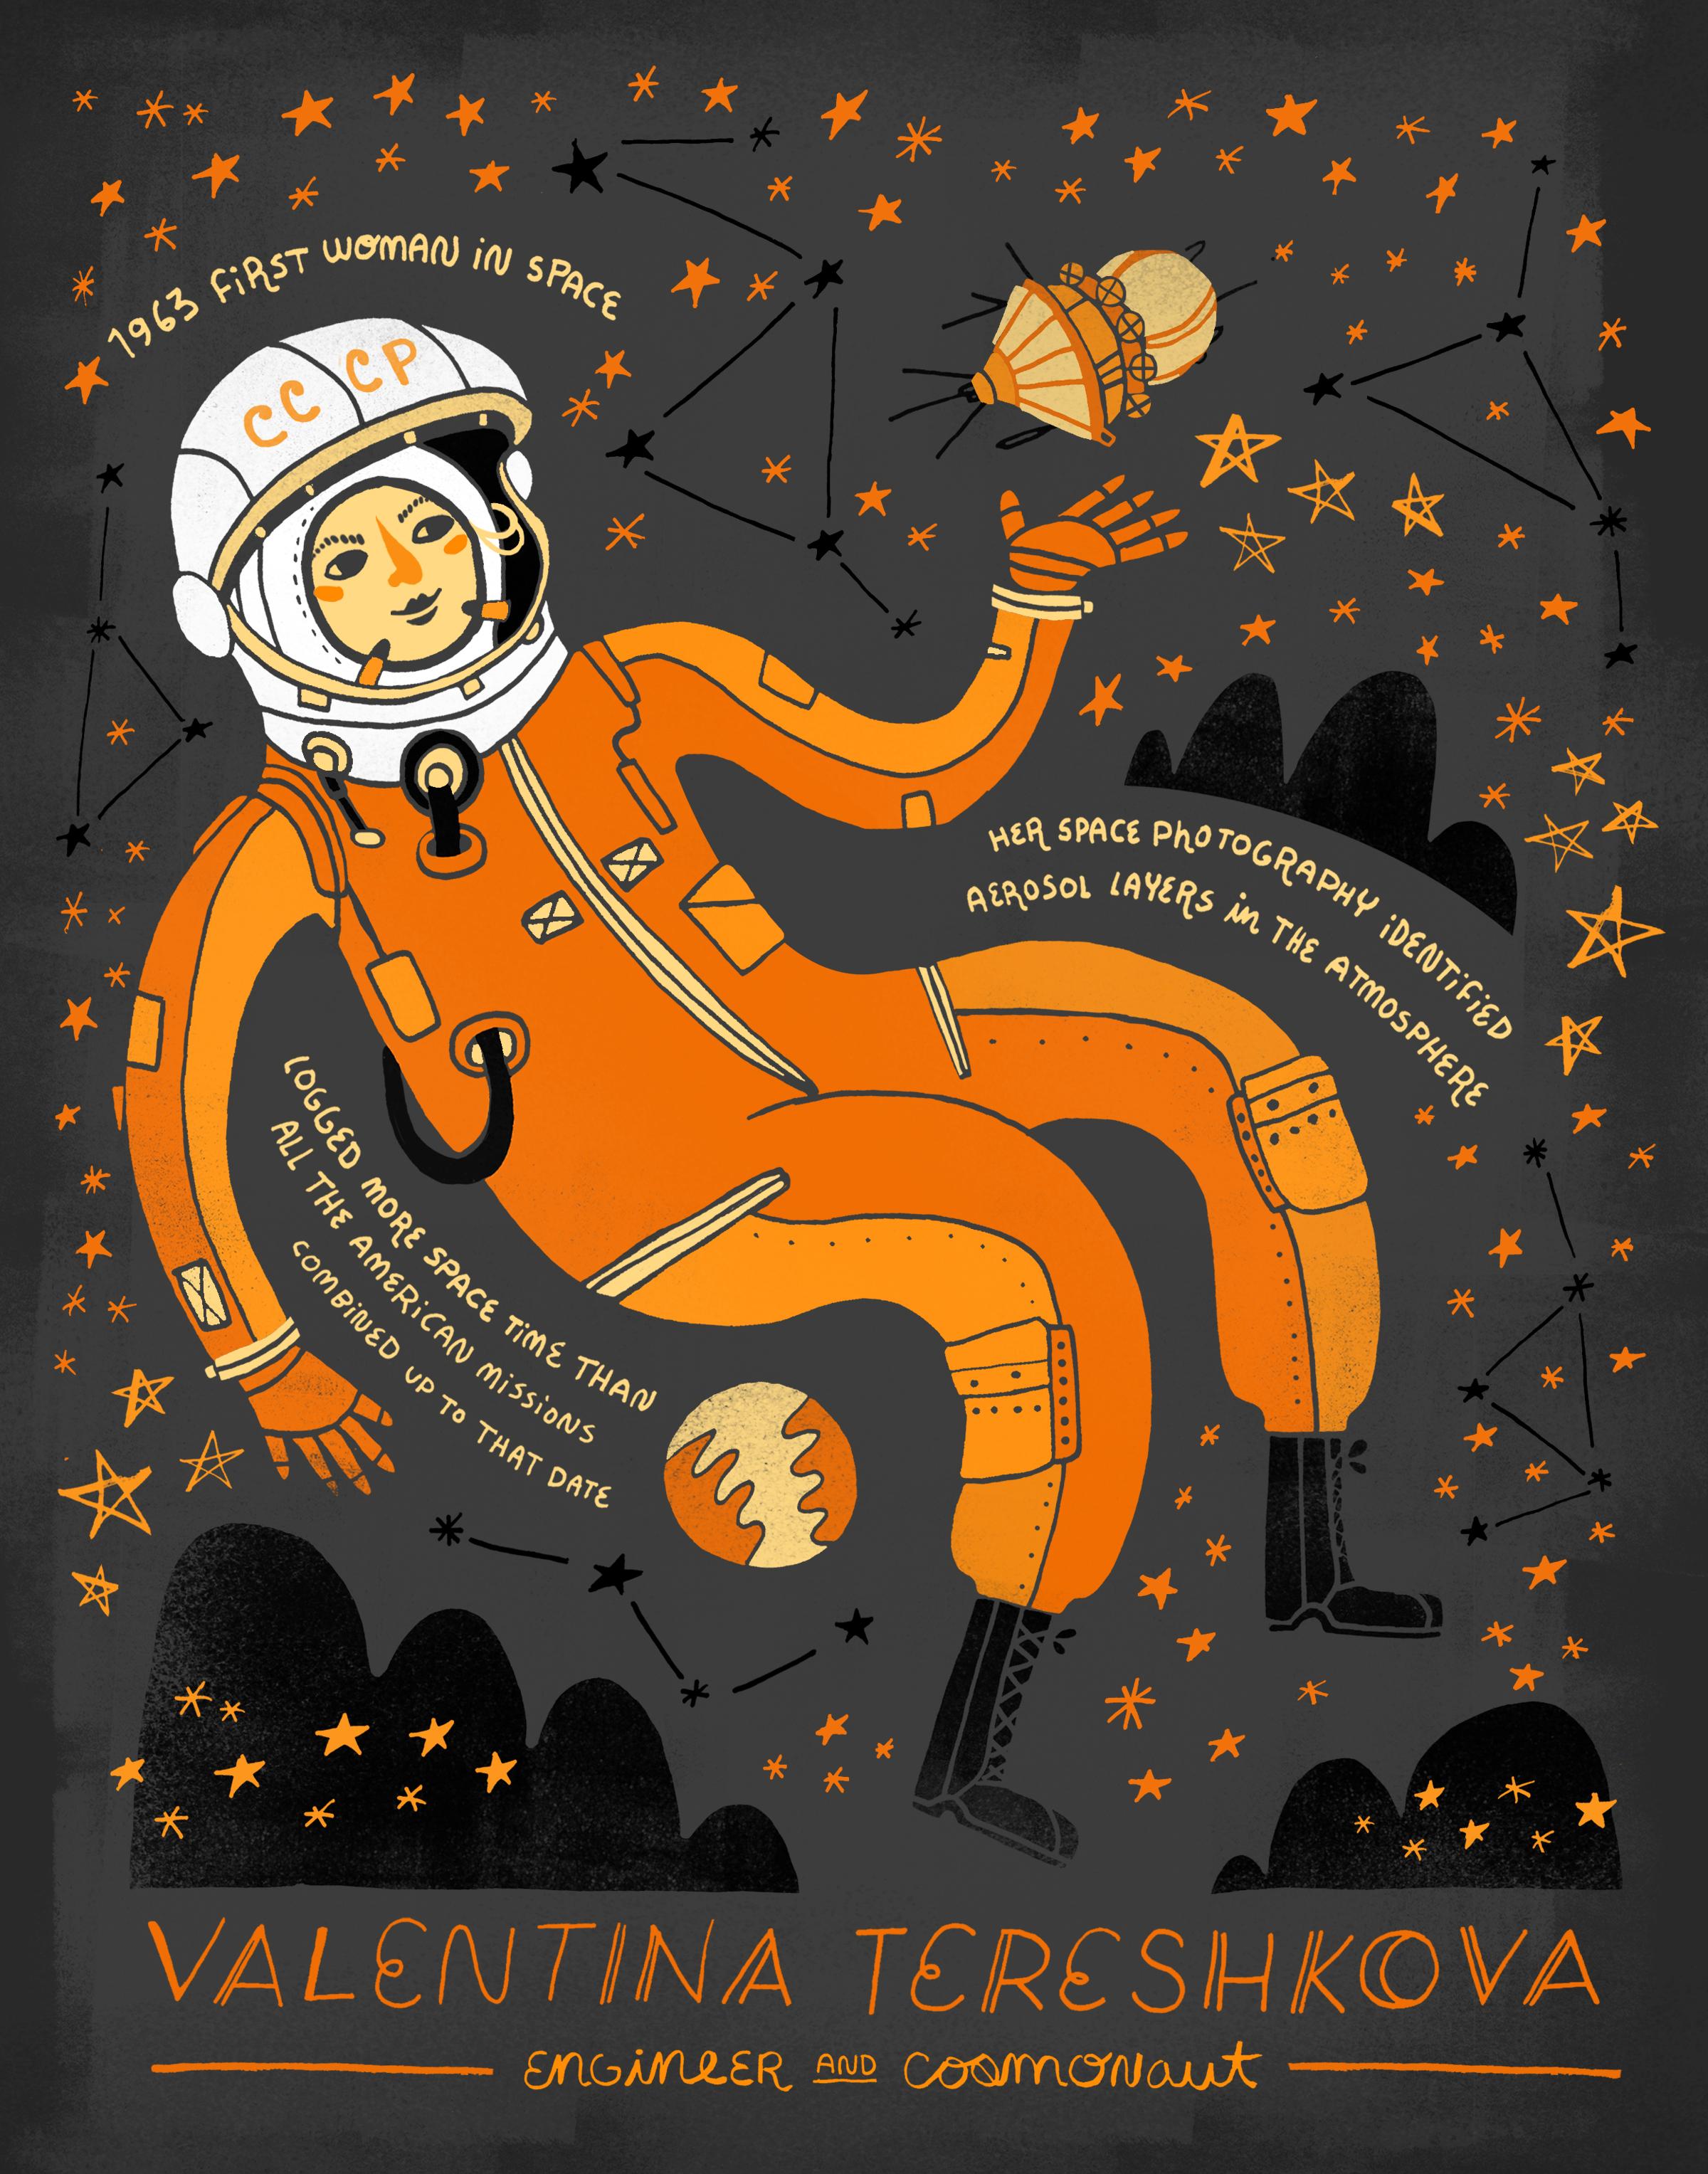 valerie tereshkova.jpg